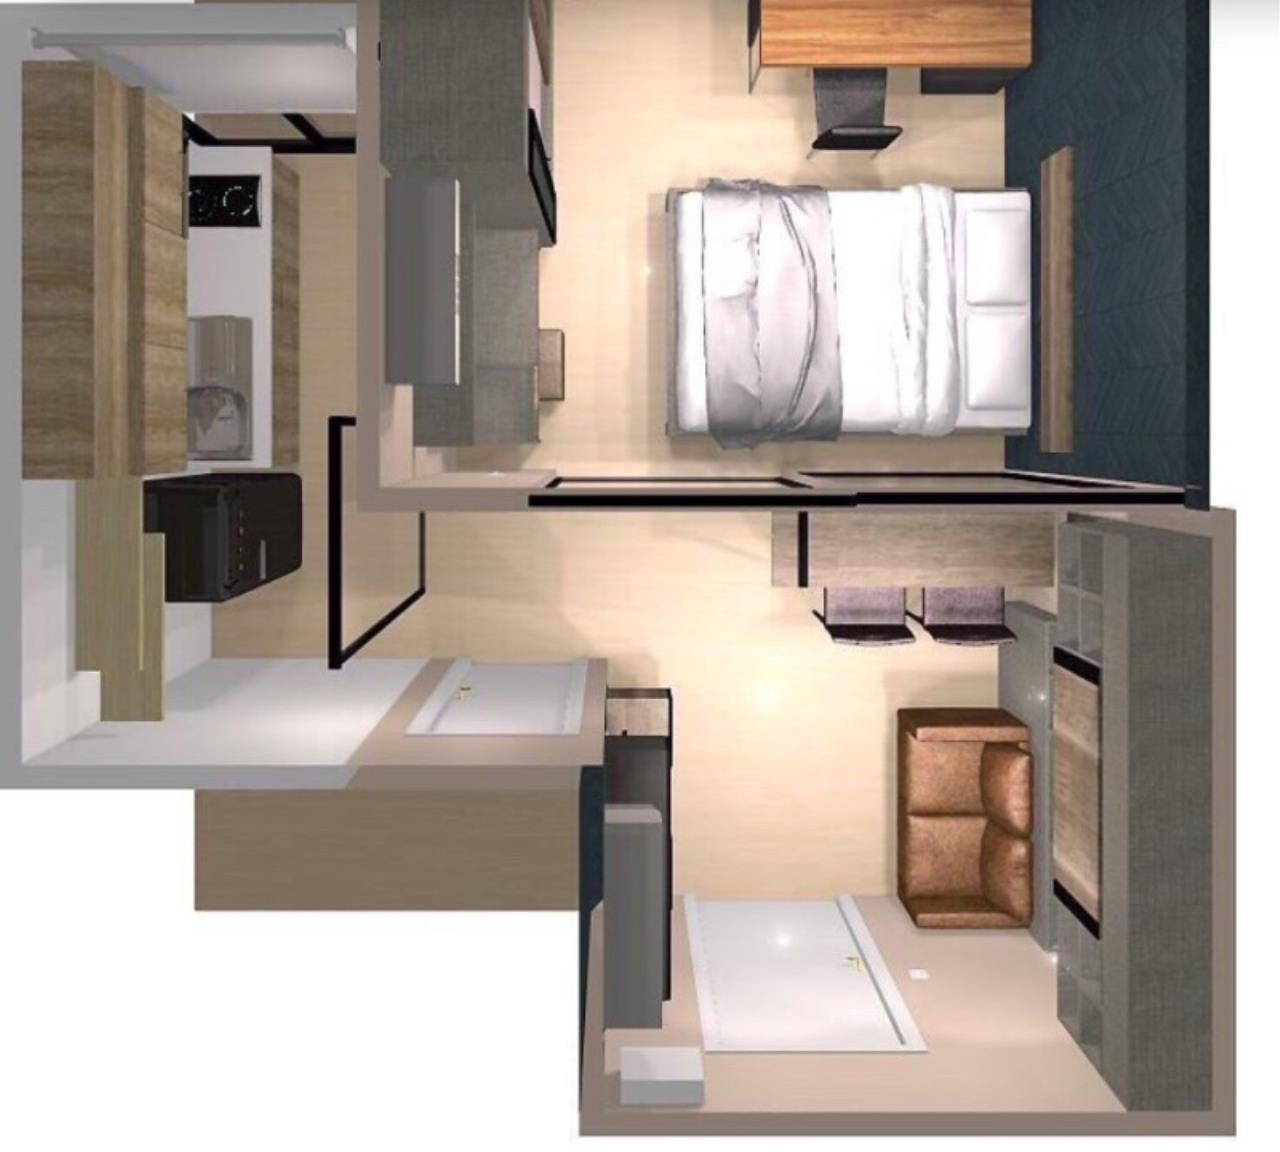 Century21 Skylux Agency's Life Asoke / Condo For Sale / 1 Bedroom / 30 SQM / MRT Phetchaburi / Bangkok 1